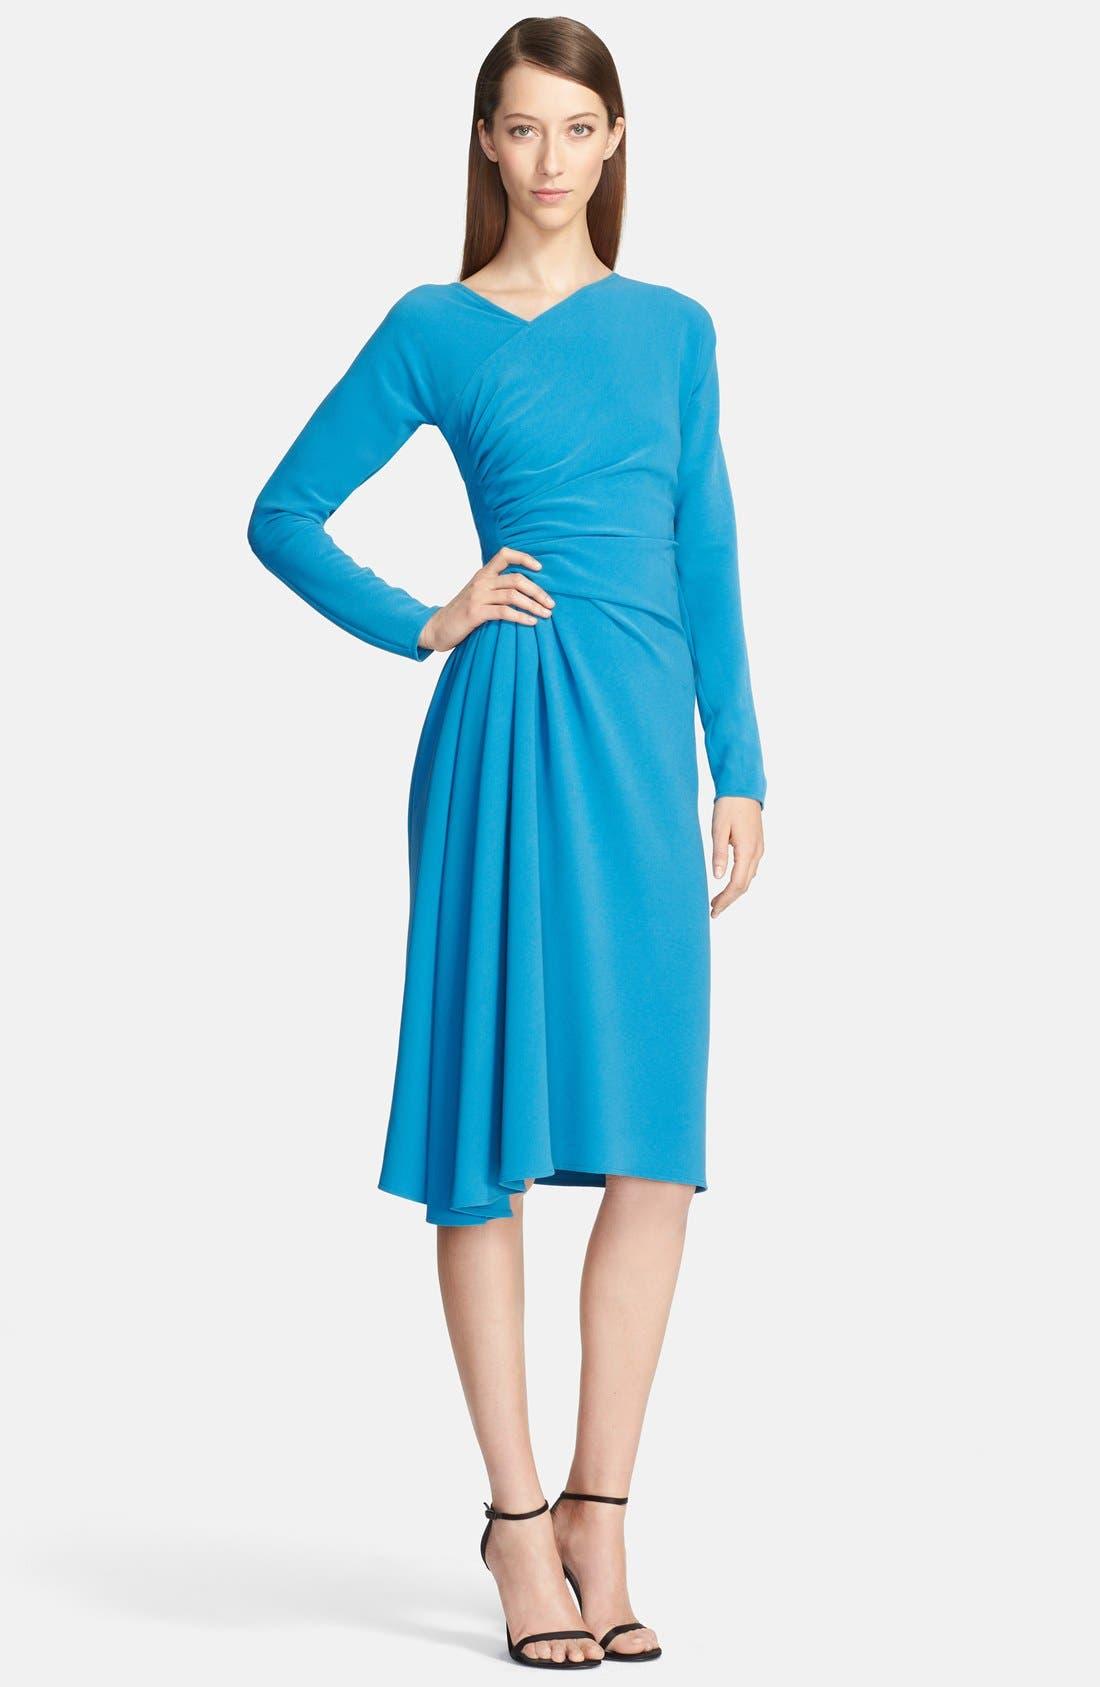 Main Image - St. John Collection Asymmetrical Drape Luxe Crepe Dress